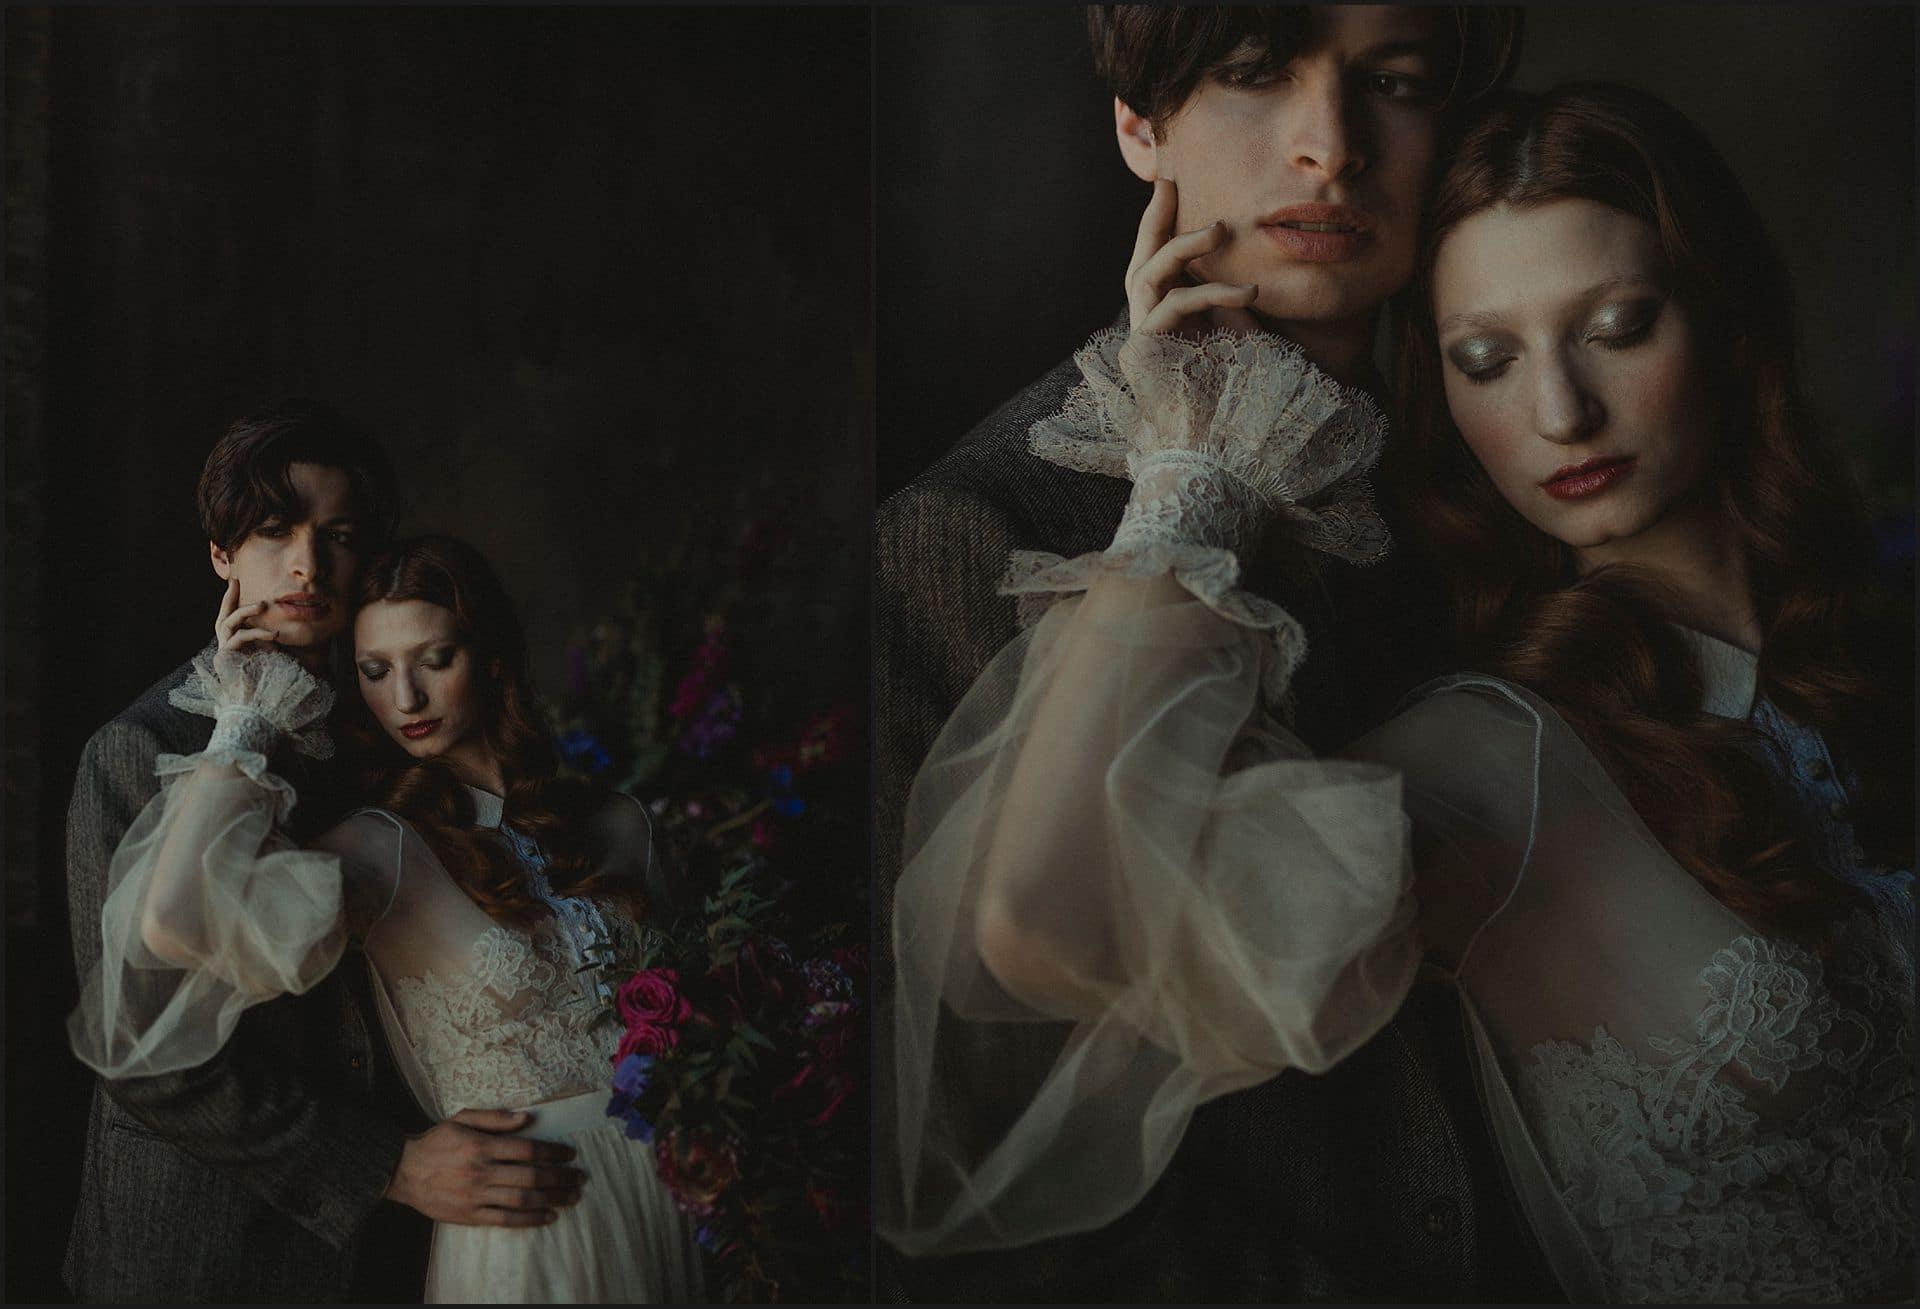 decadence, fine art wedding, wedding dress, intimate portrait, bride, groom, unconventional wedding, cross studio, milan, wedding photographer, wedding in italy